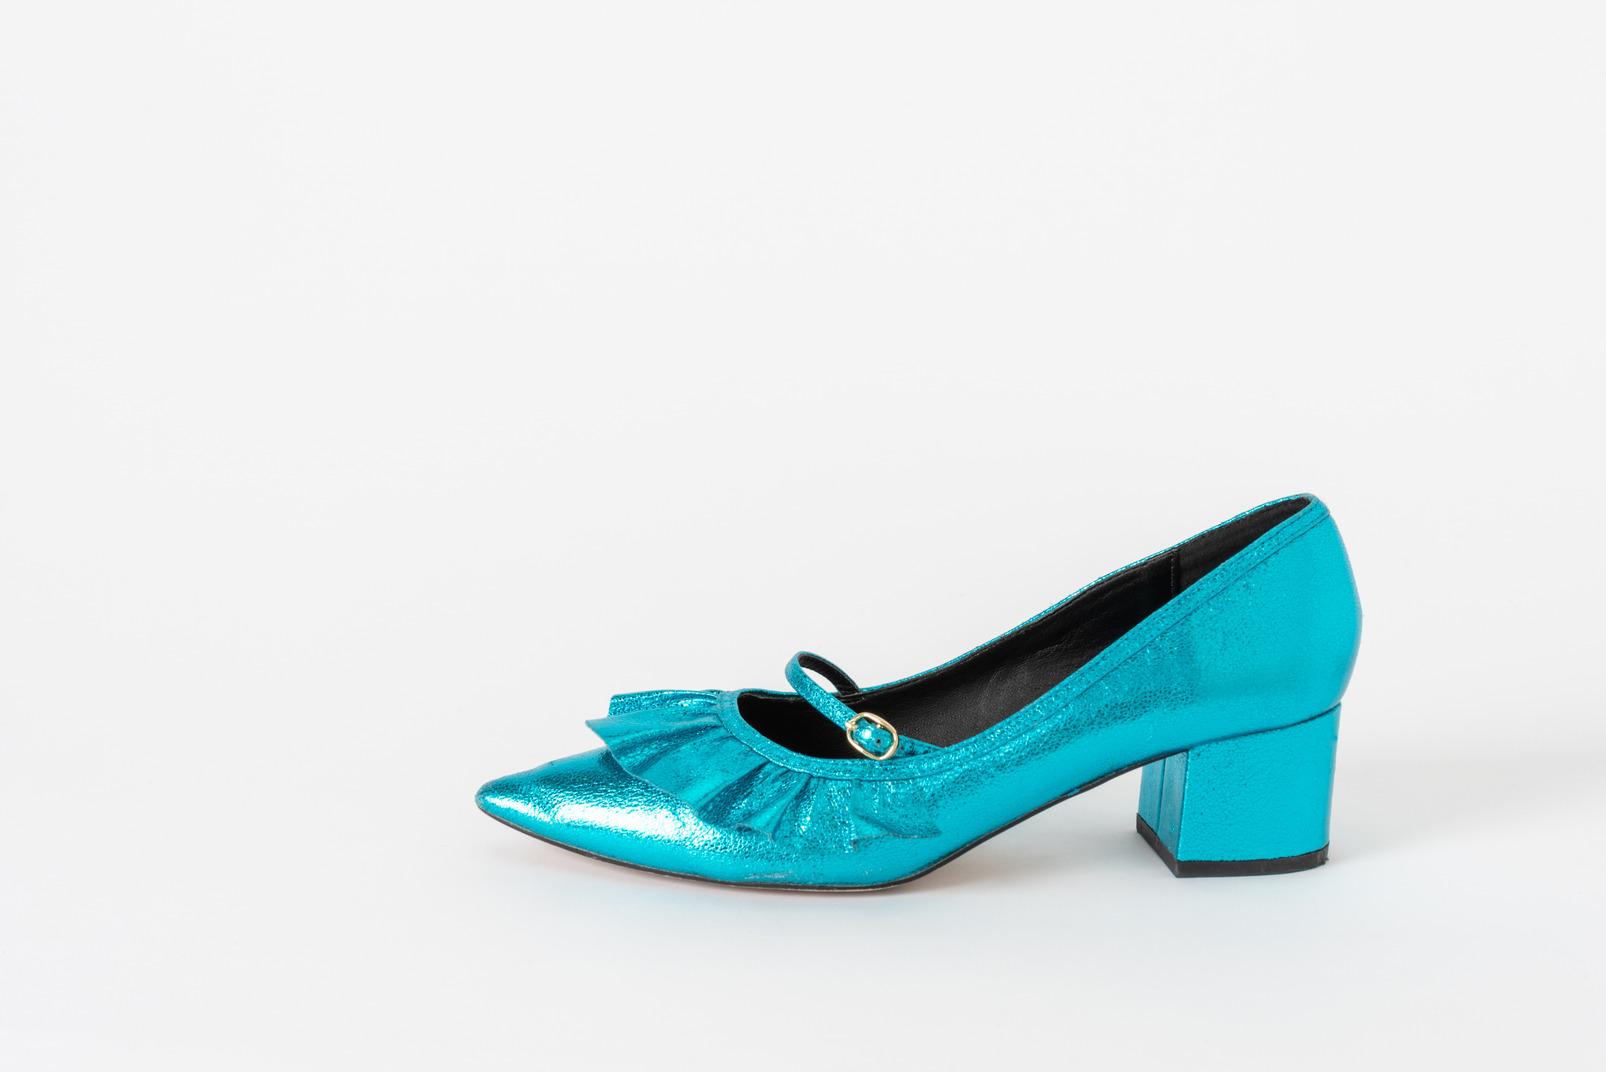 A single blue shoe